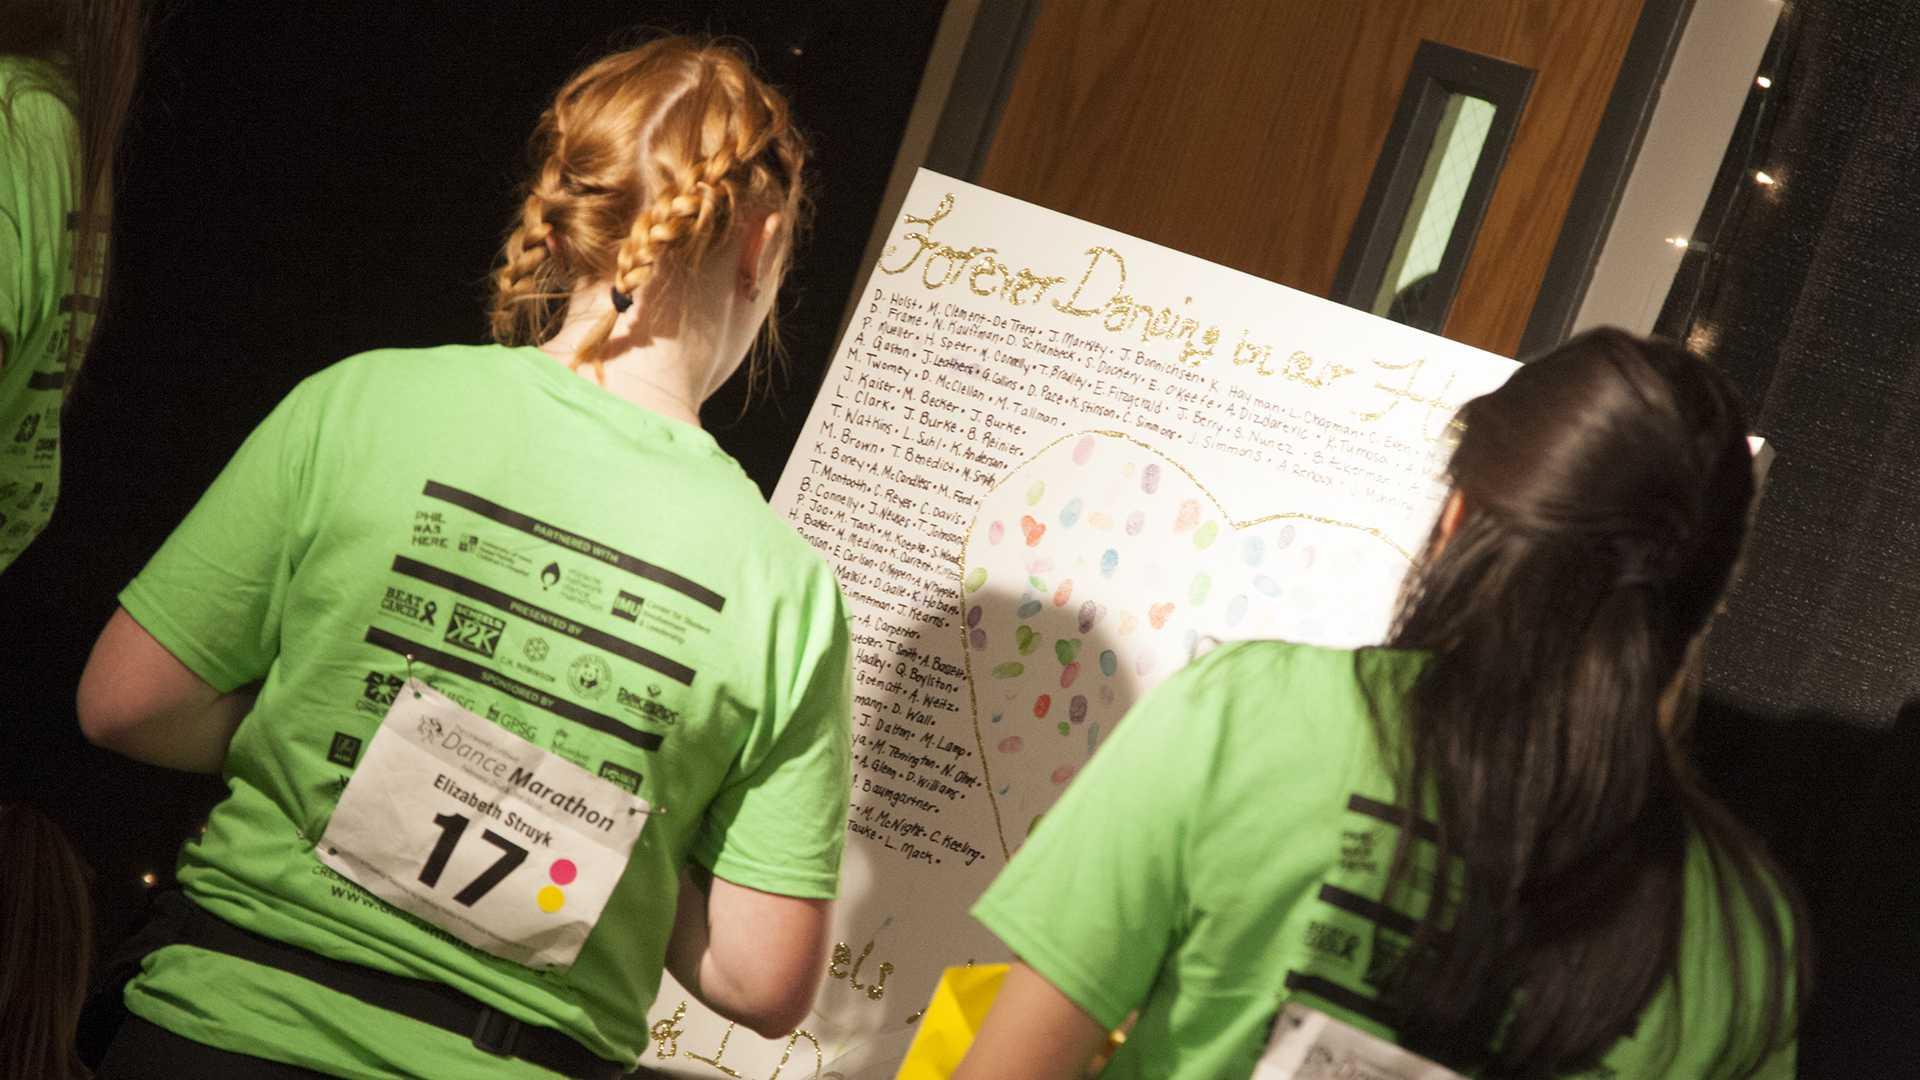 Dance Marathon participants Elizabeth Struyk and Elizabeth Fuller read a board in the